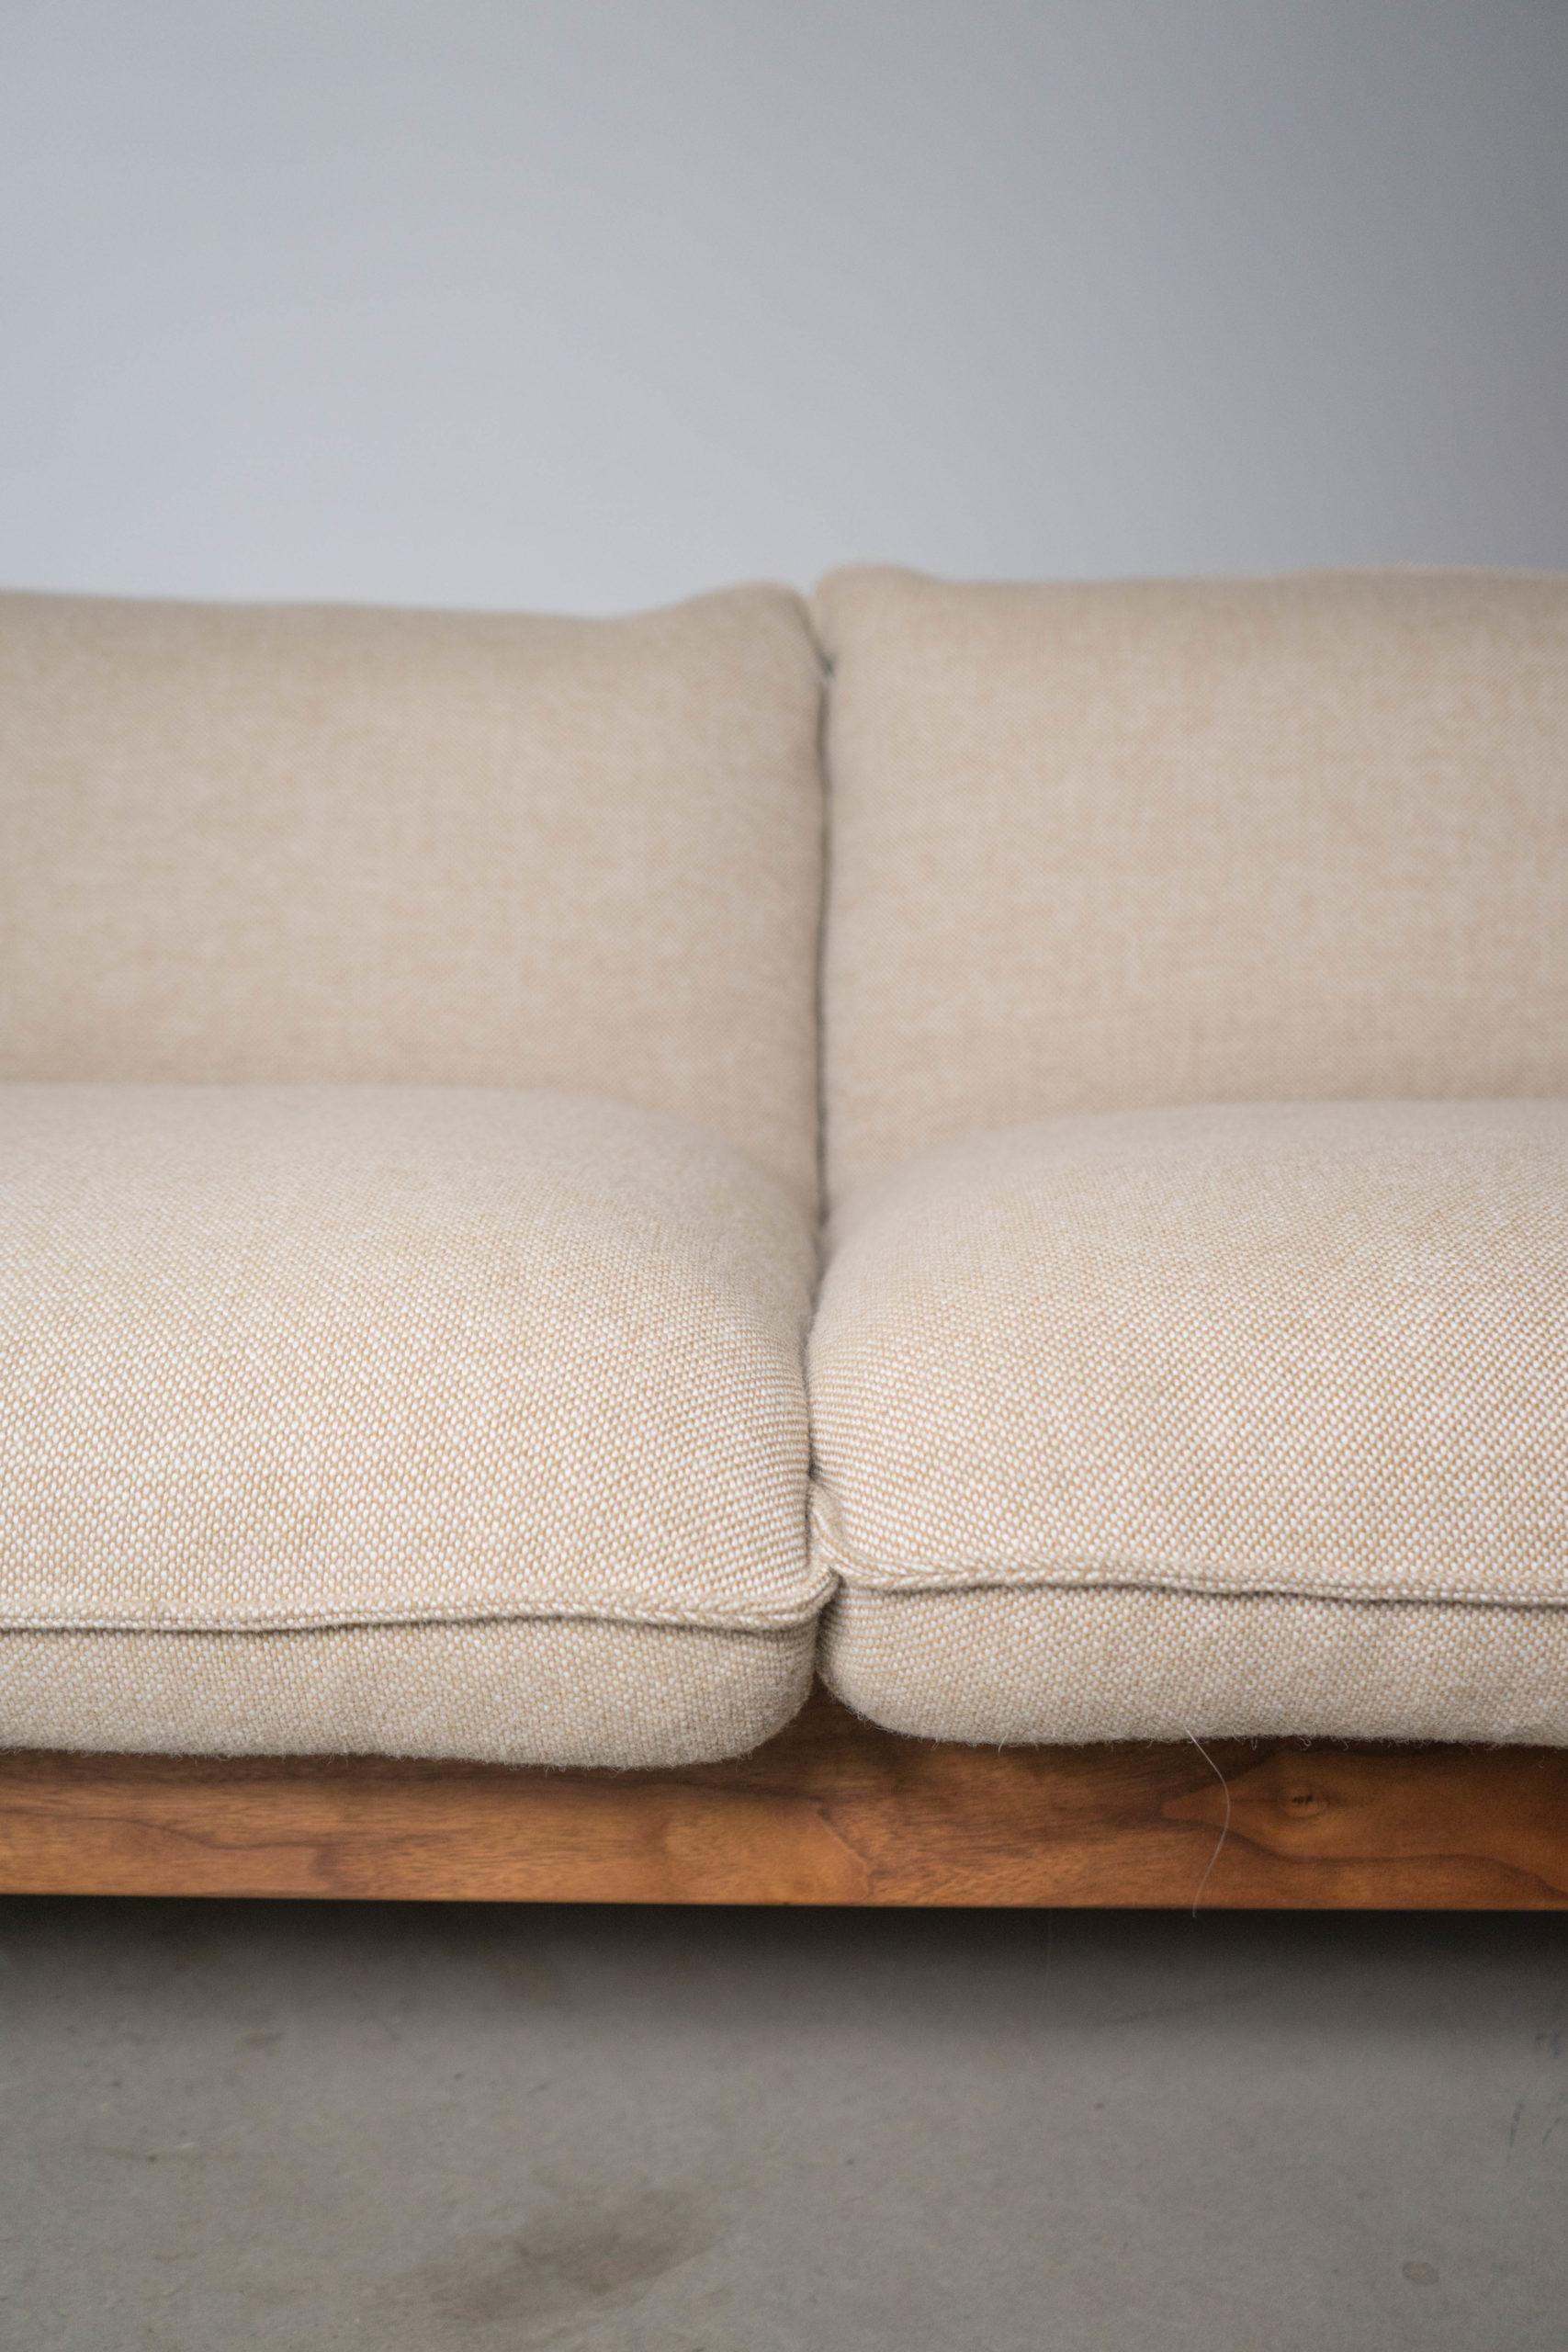 detalle de cojines tejidos de sofa tapizado